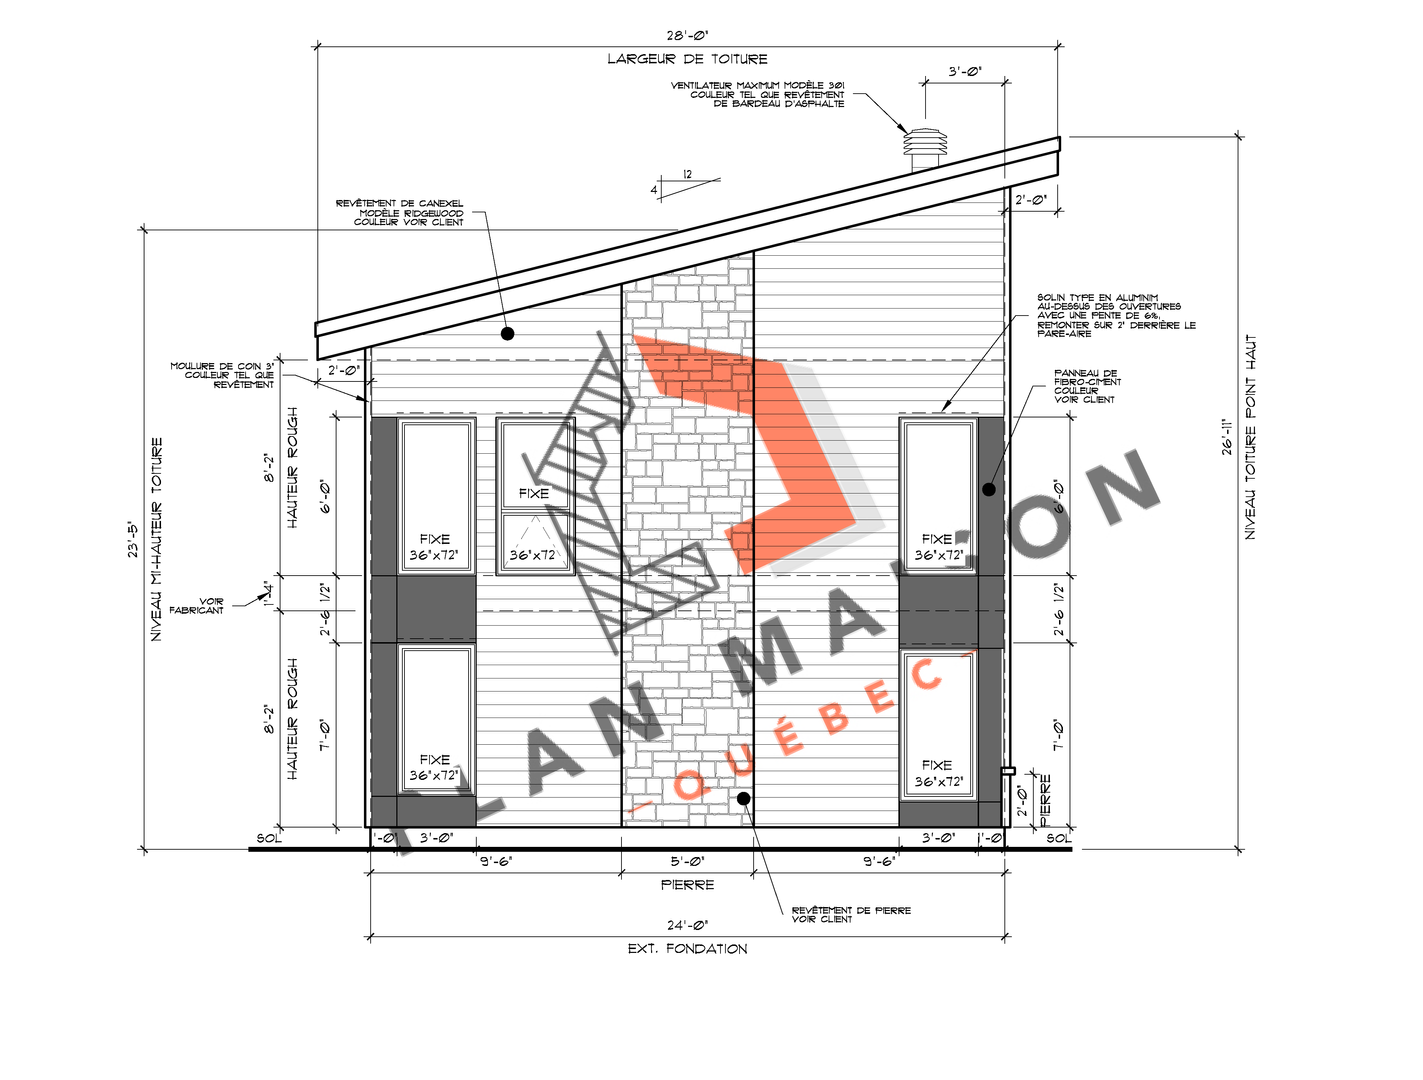 construire maison plan 2